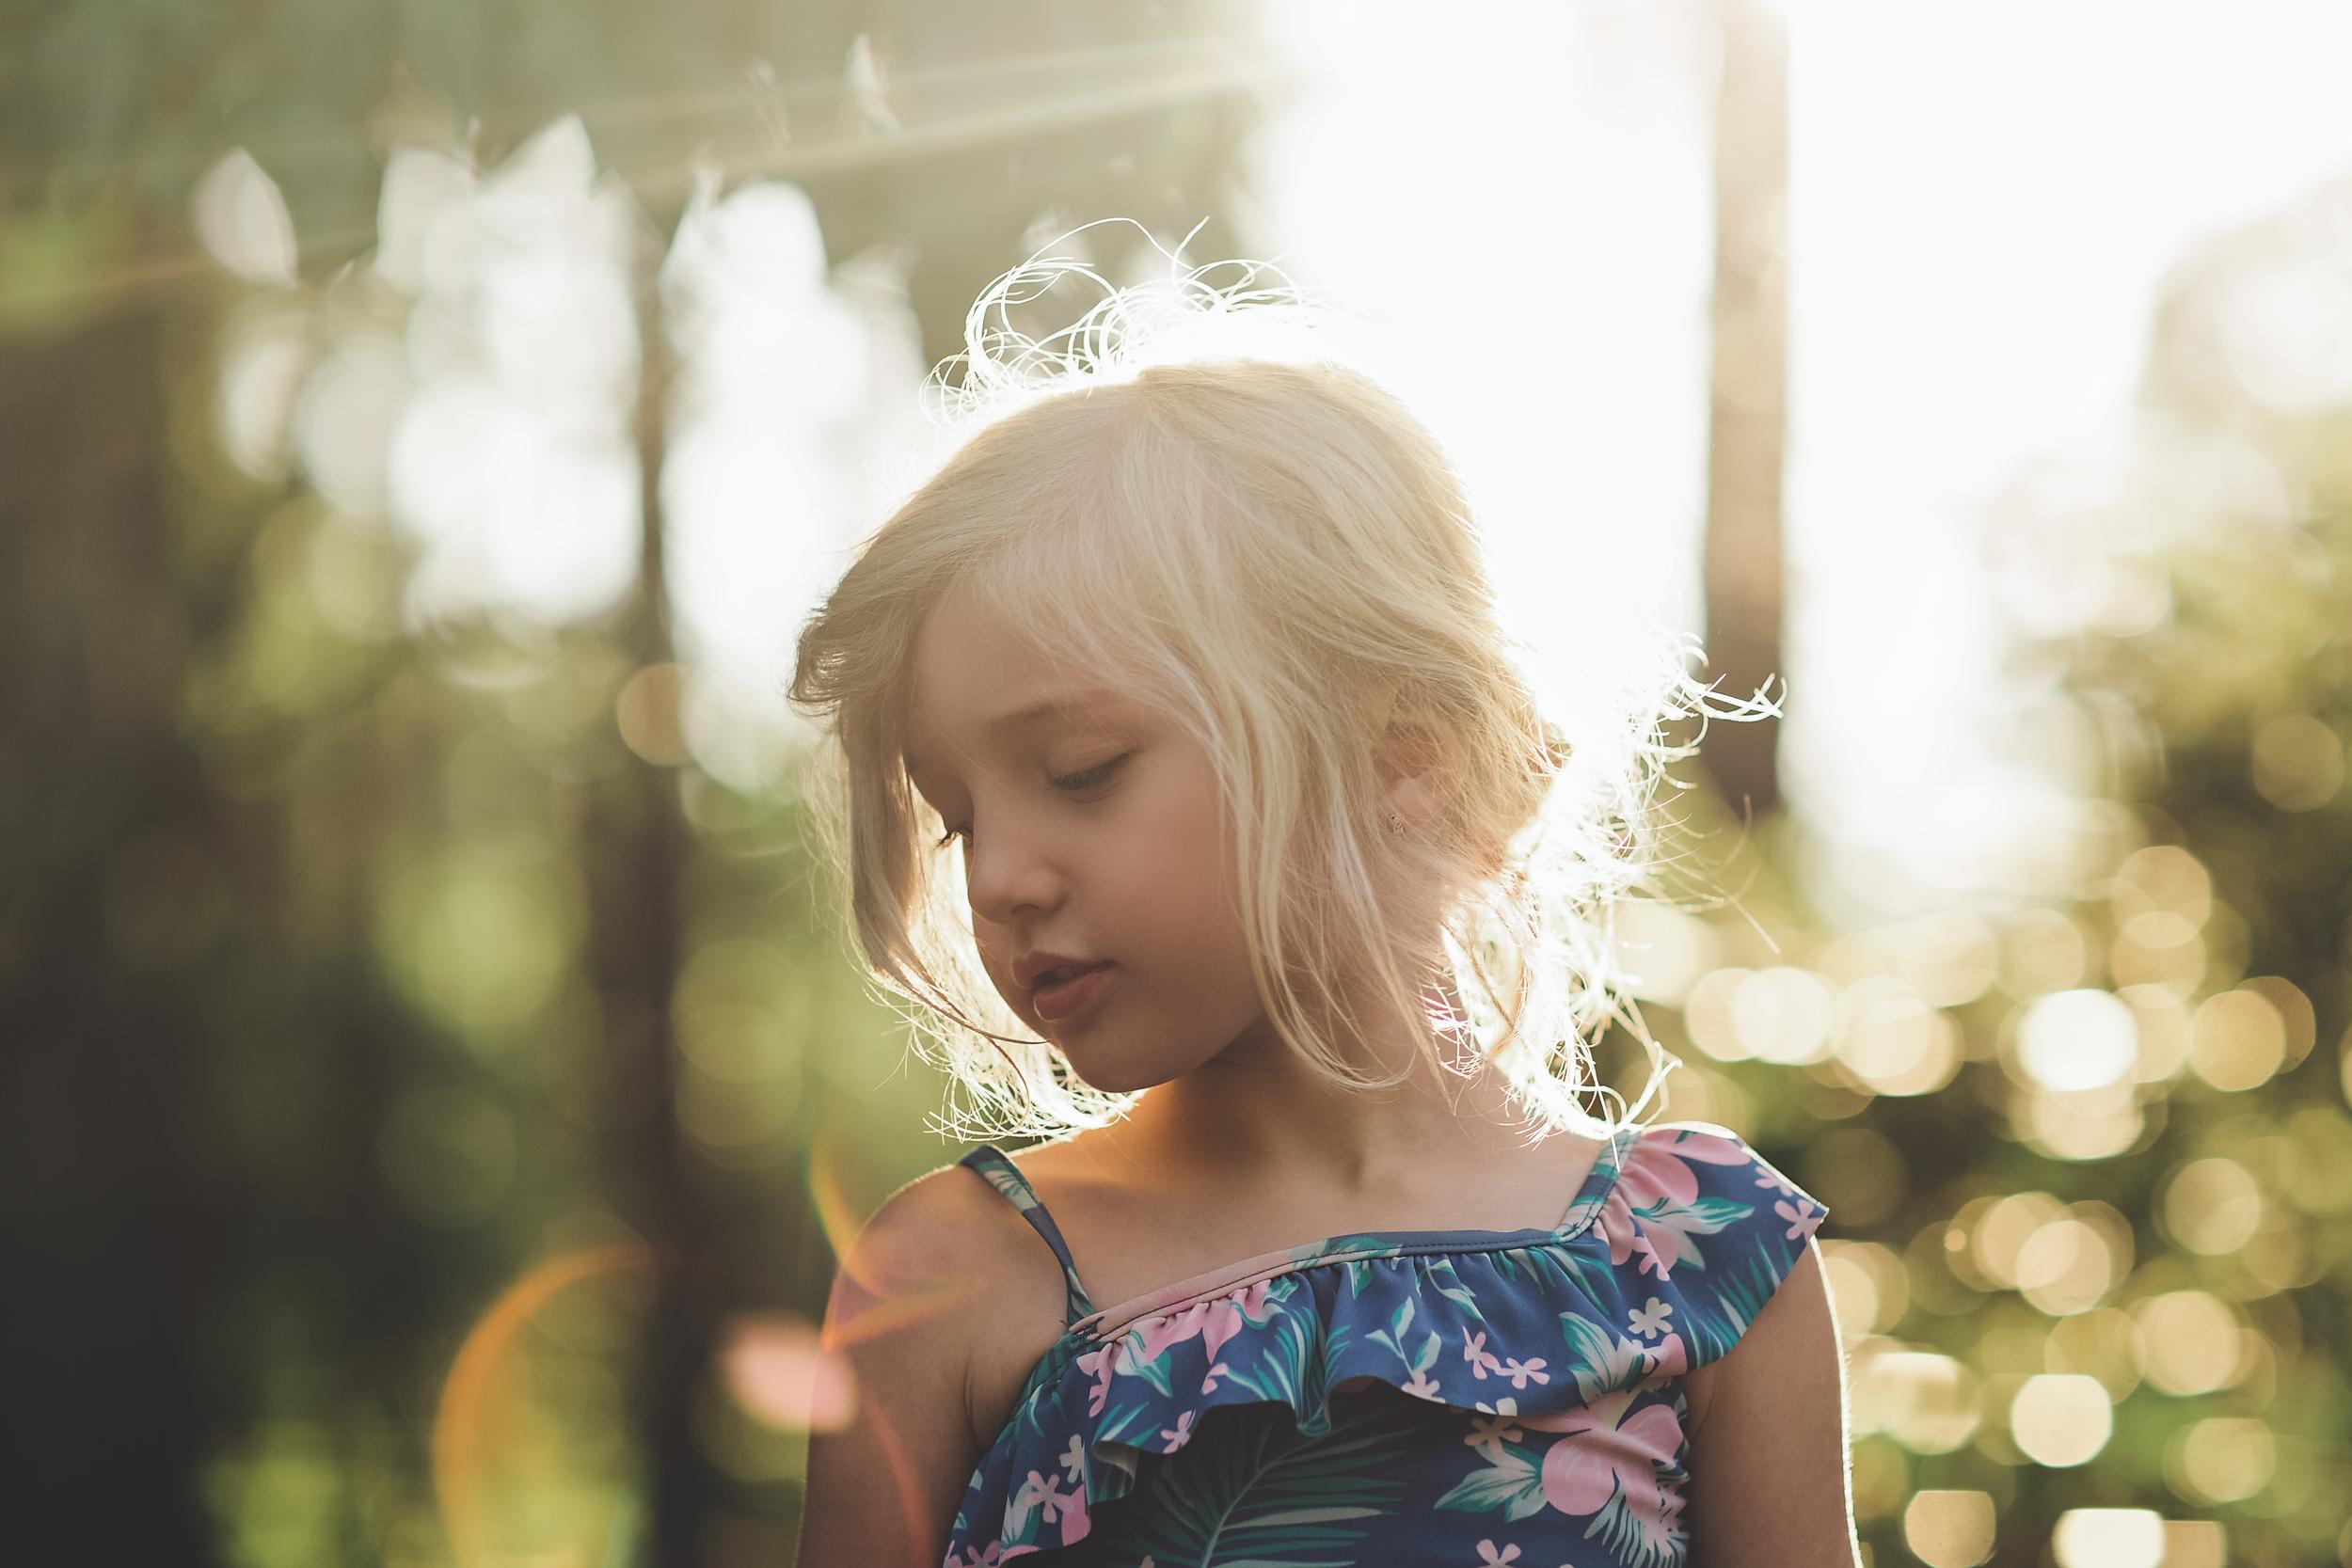 Hello-olivia-photography-long-lsland-family-children-documentary-photographer-childrens-portrait-flare